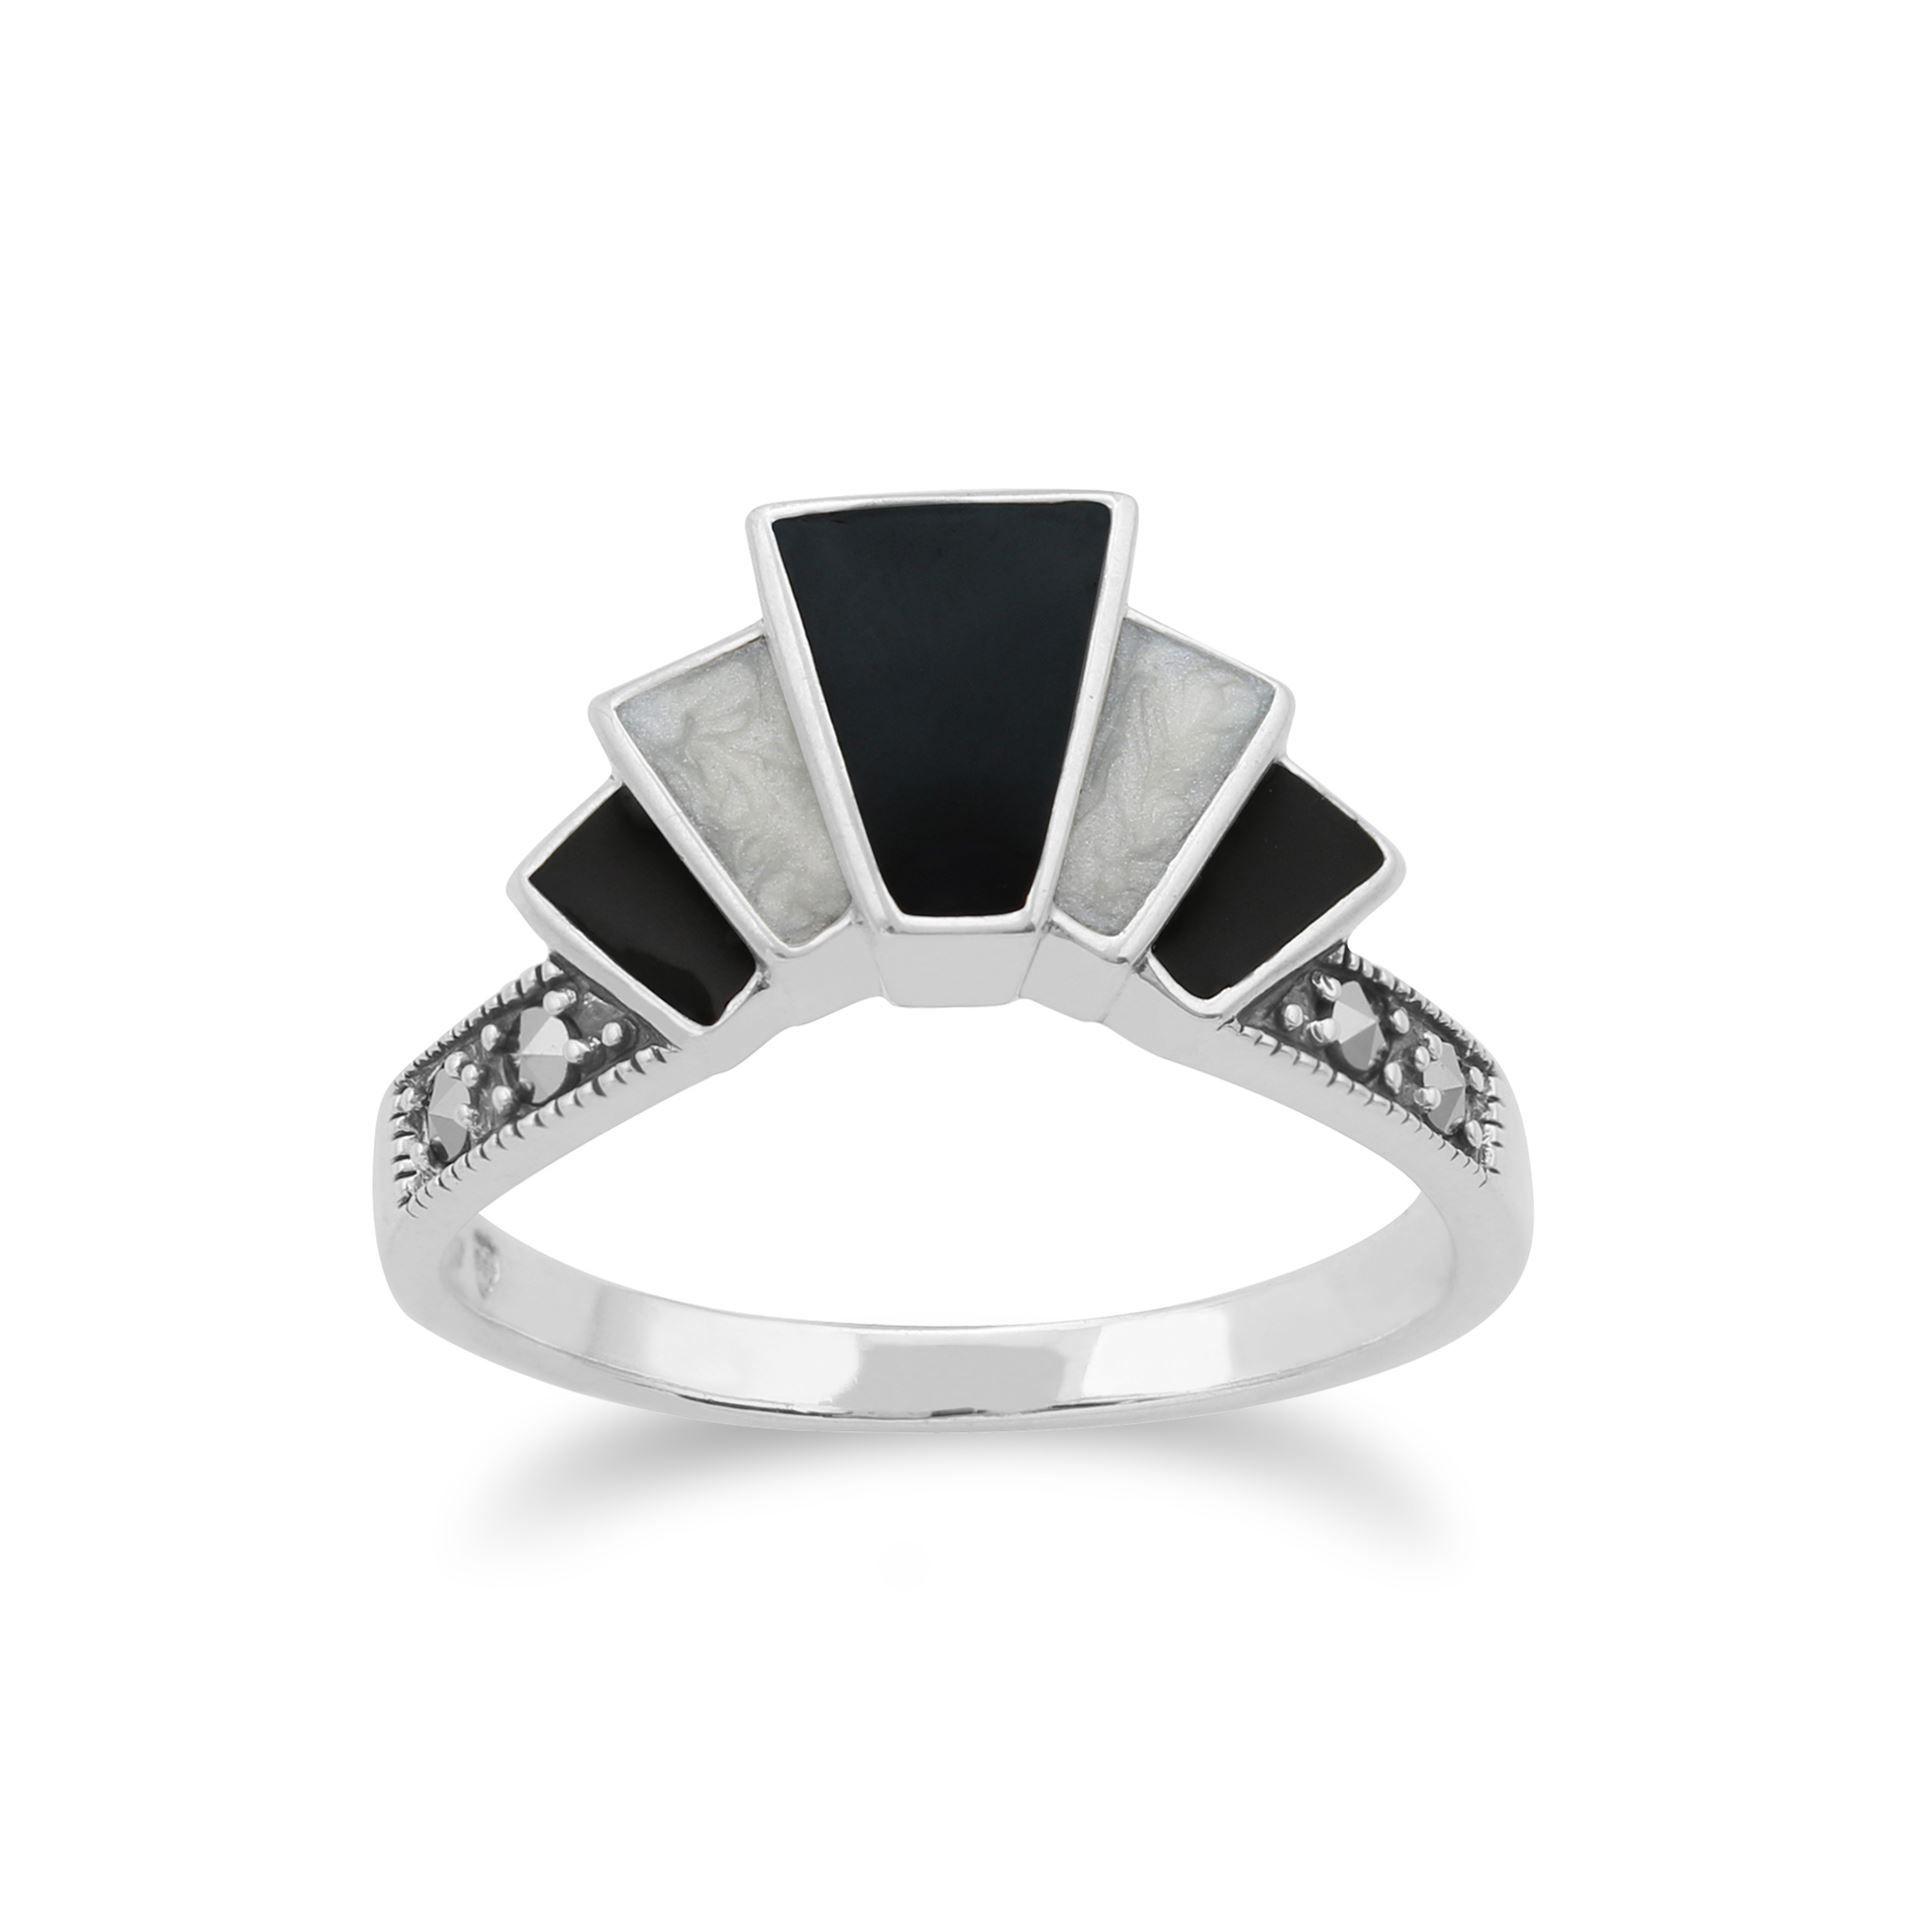 Gemondo Sterling Silver Art Deco 1.20ct Black Spinel & Marcasite Ring QKN6OqQrl